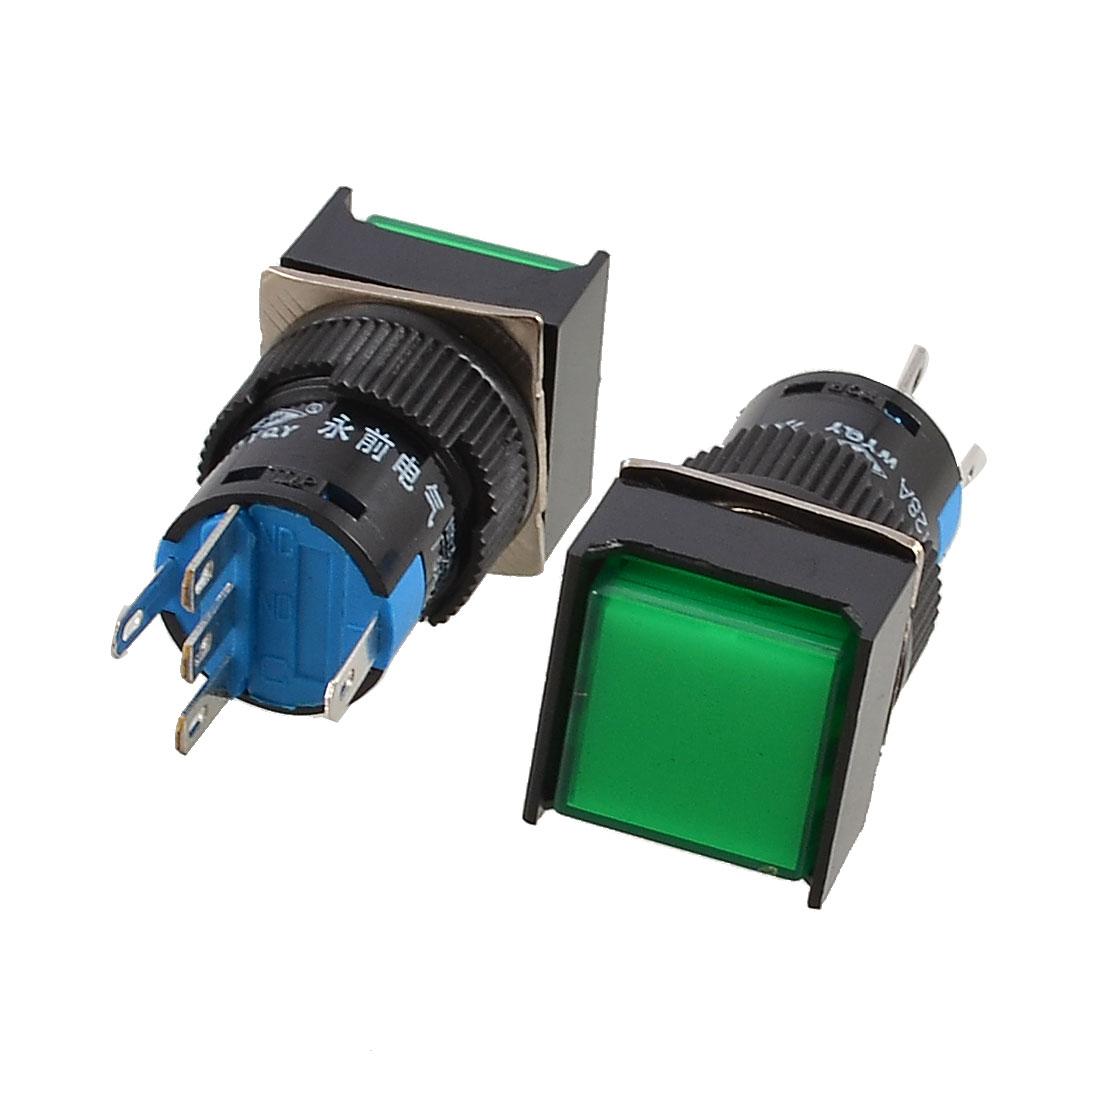 2-x-Green-Square-Cap-1NO-1NC-AC-250V-5A-Momentary-Push-Button-Switch